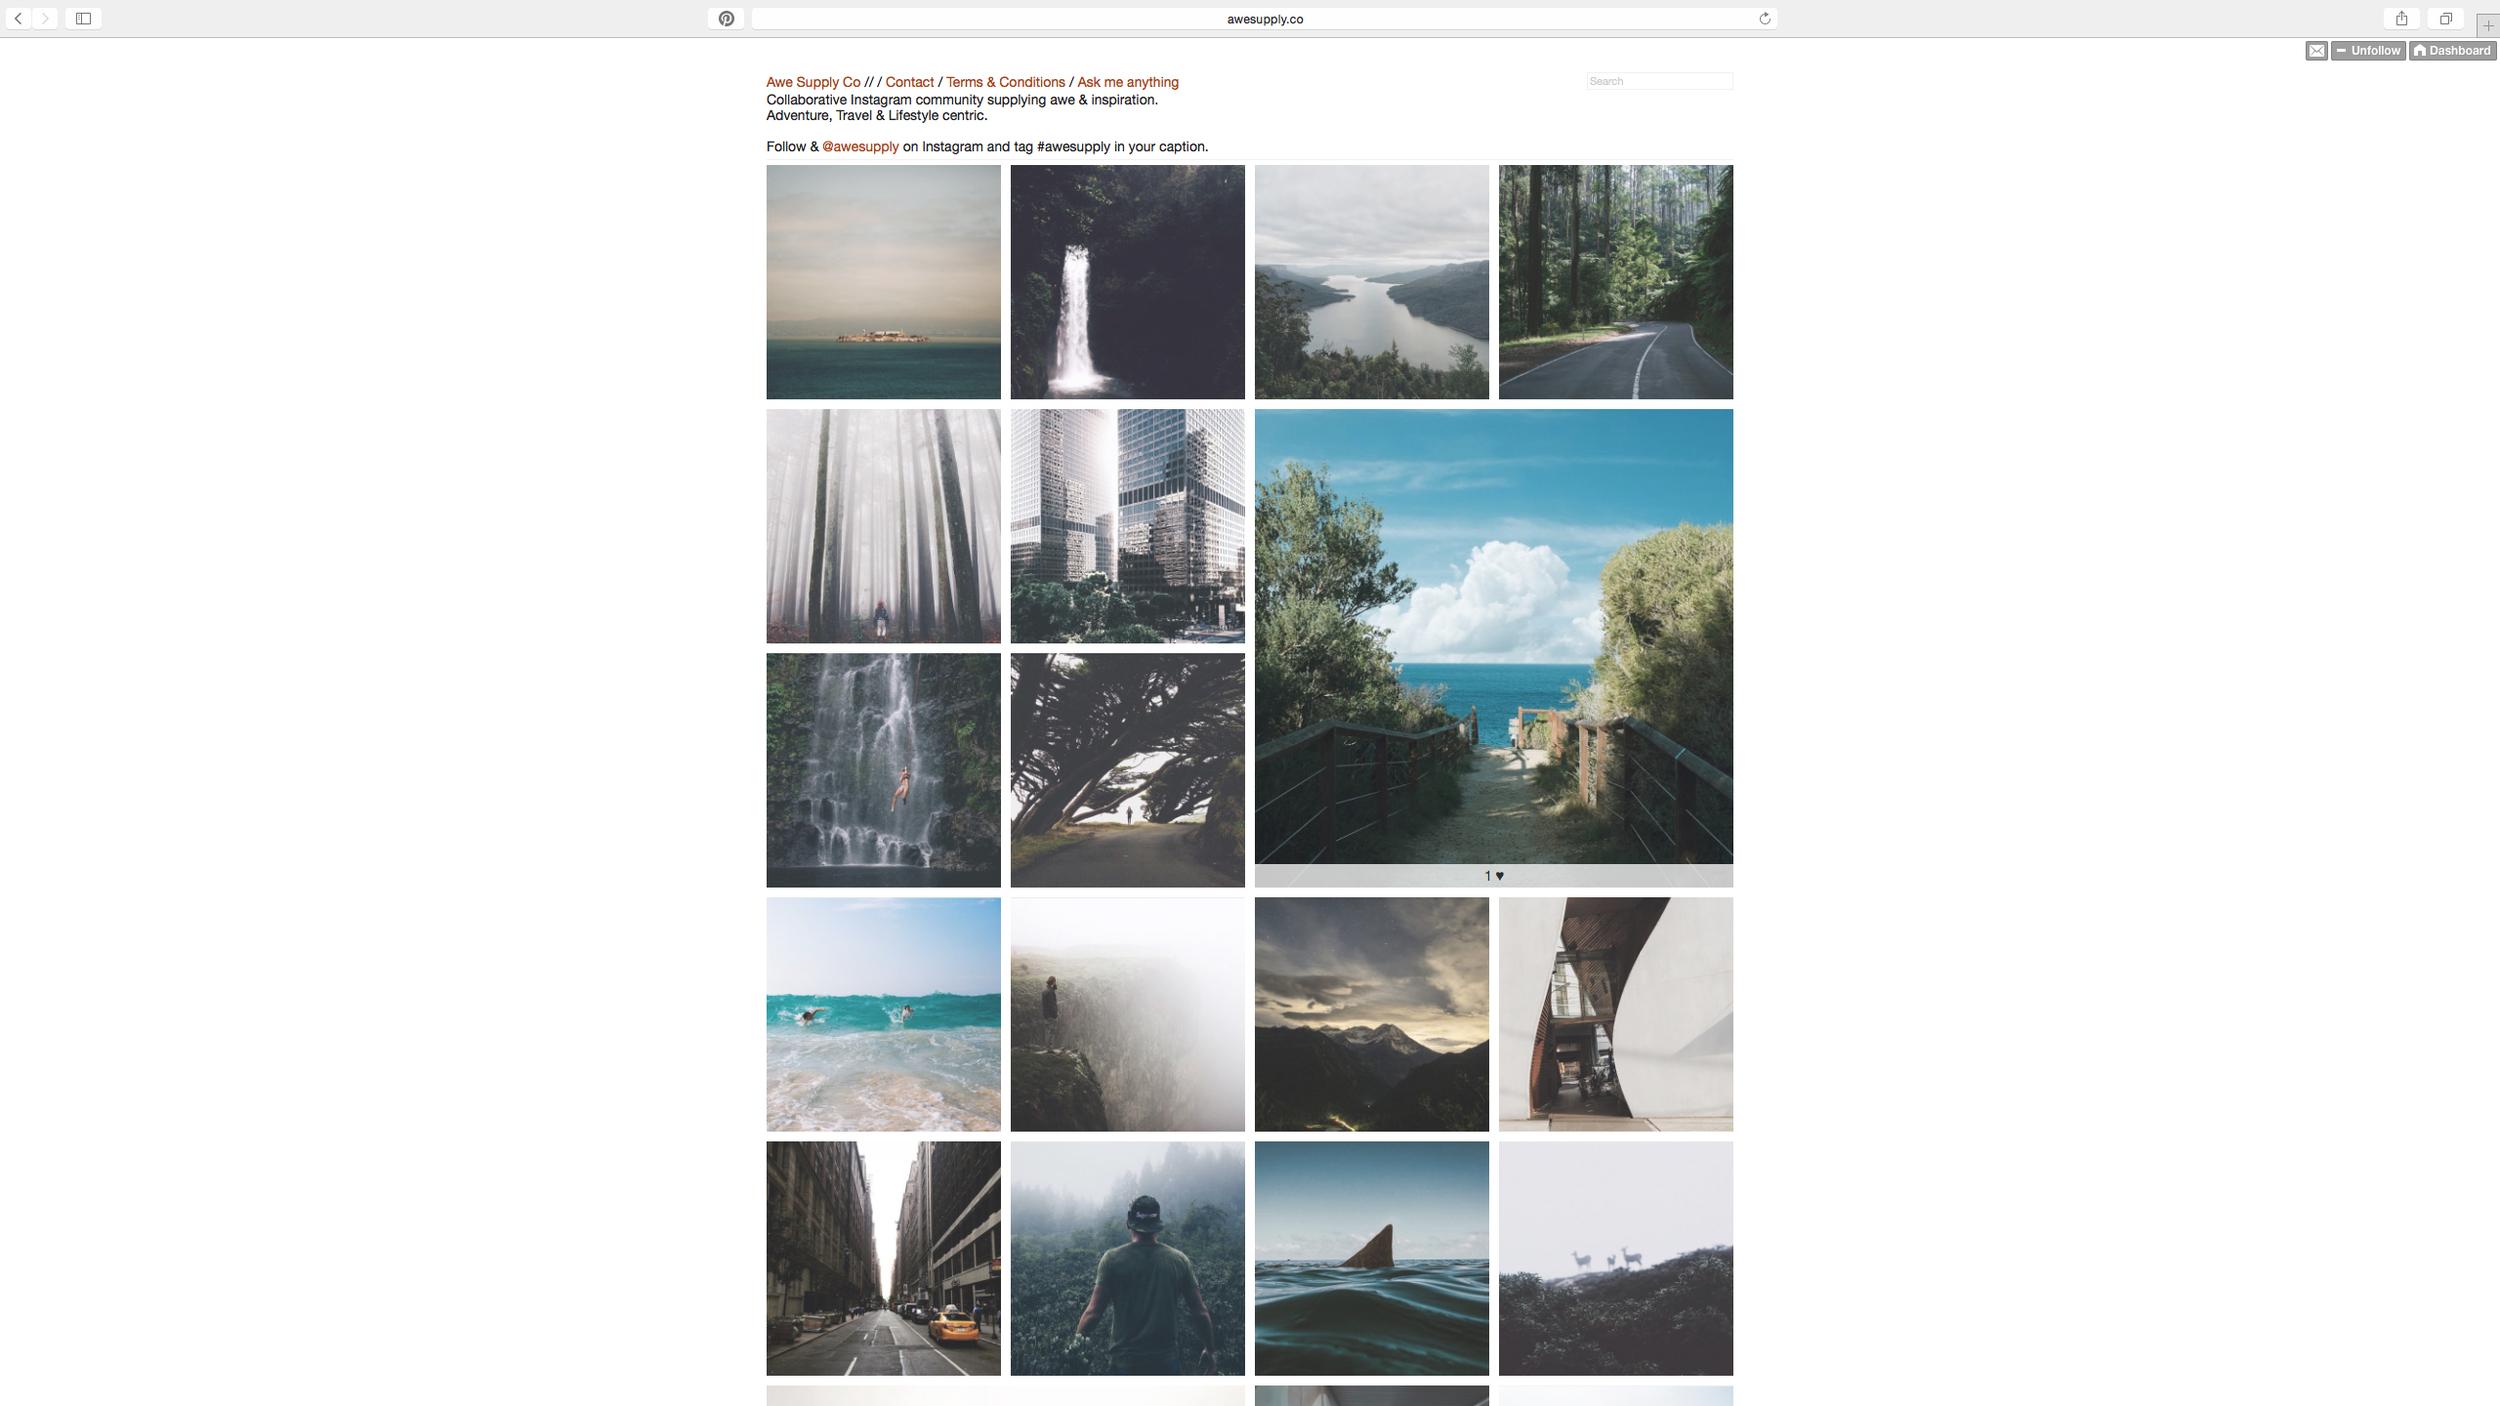 AweSupplyCo-Updated-Website